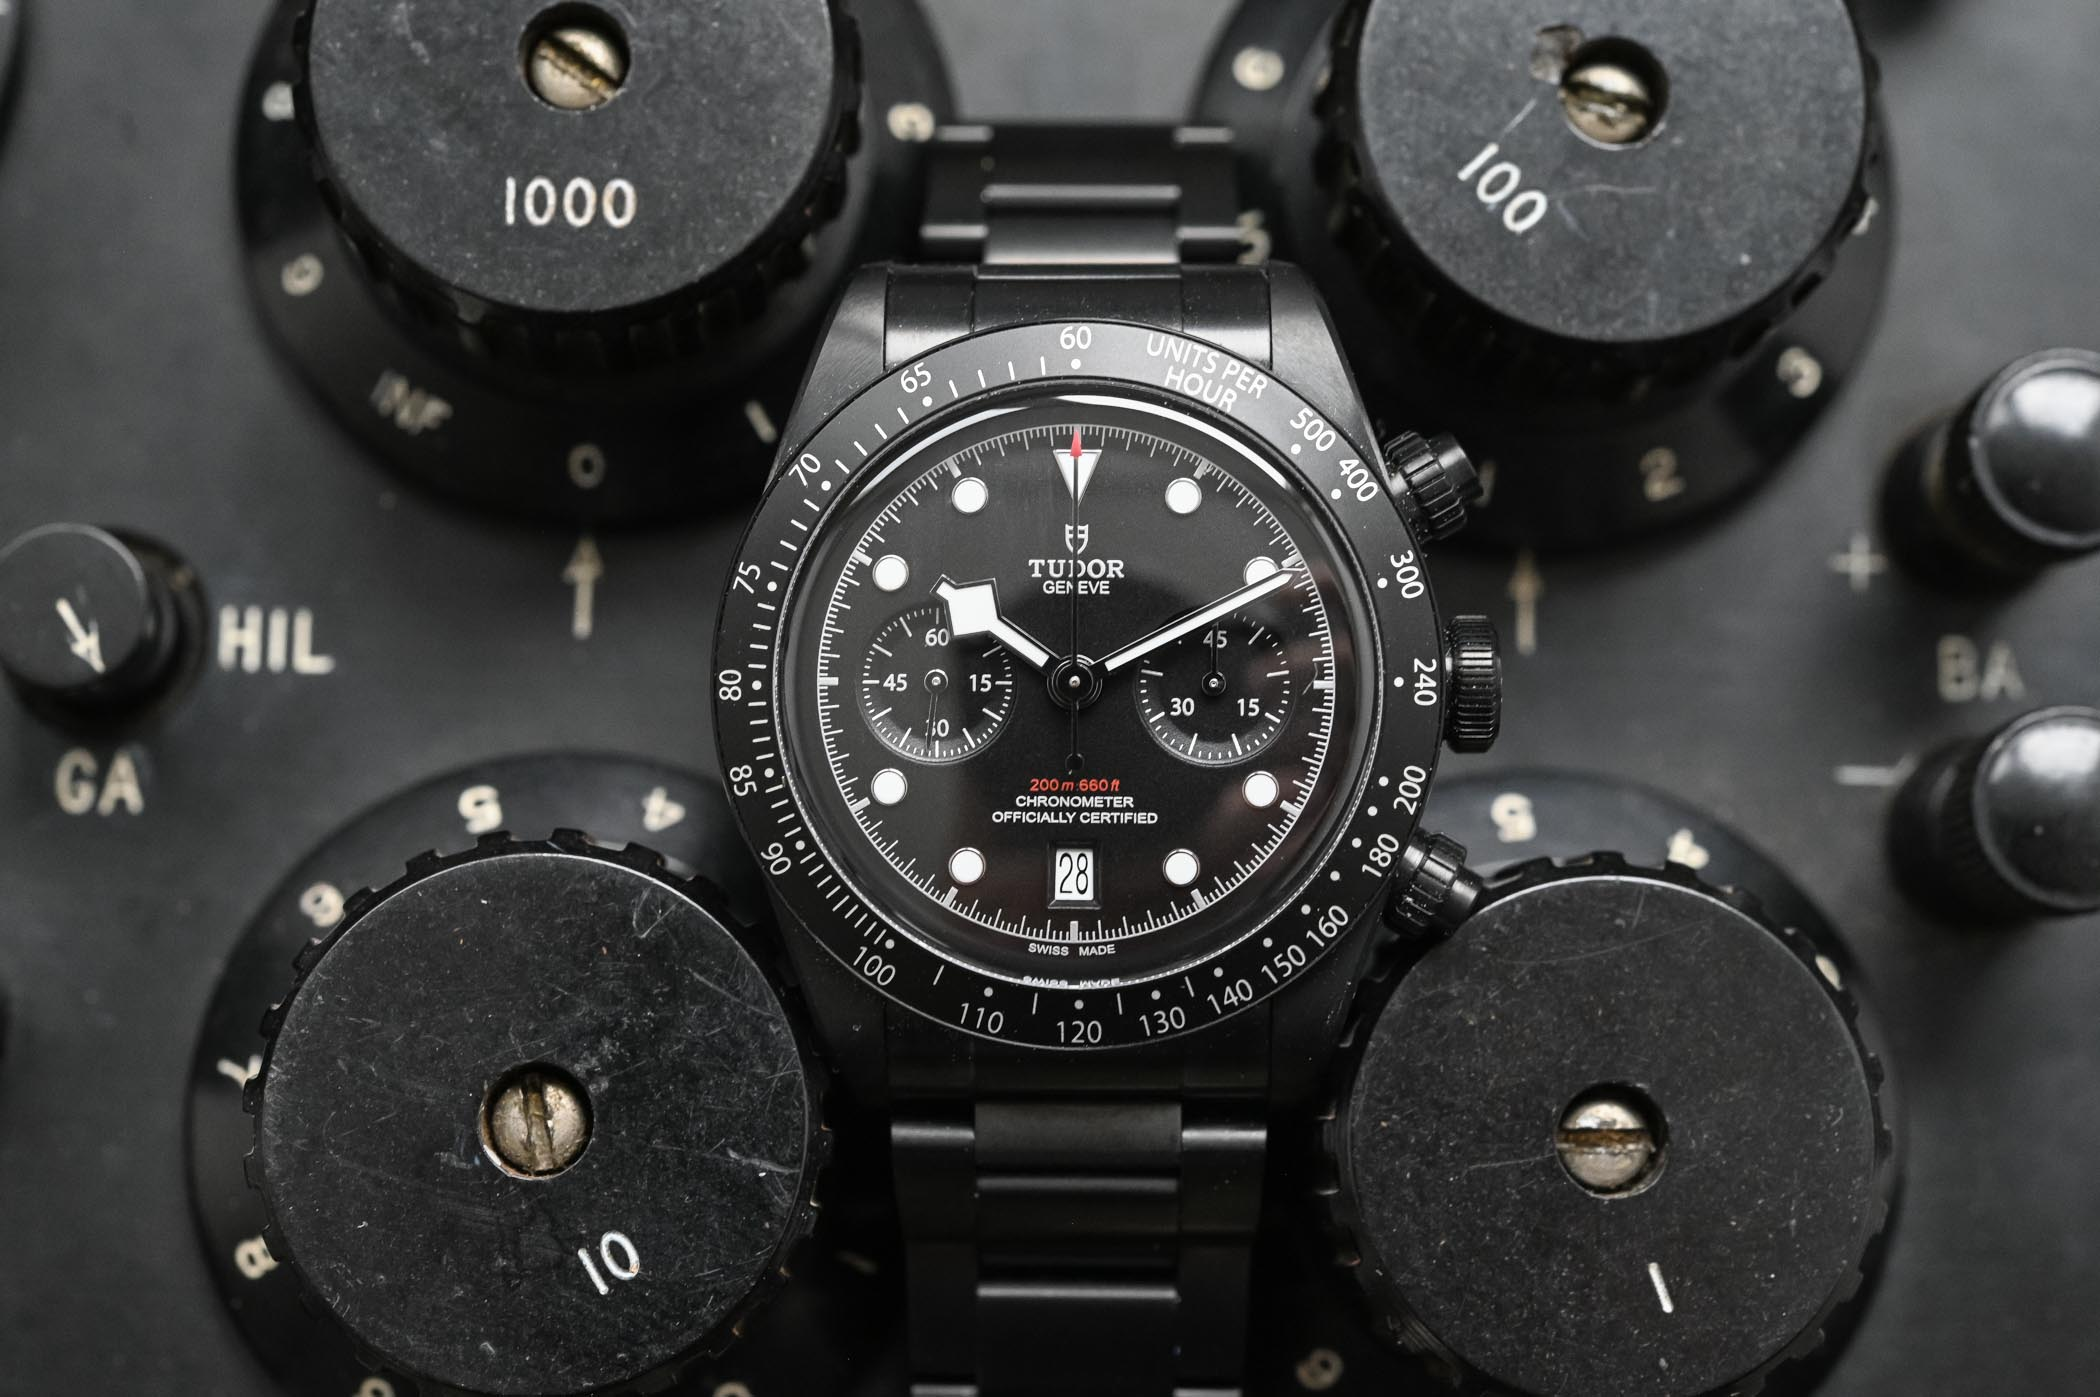 Tudor Black Bay Chrono Dark 79360DK